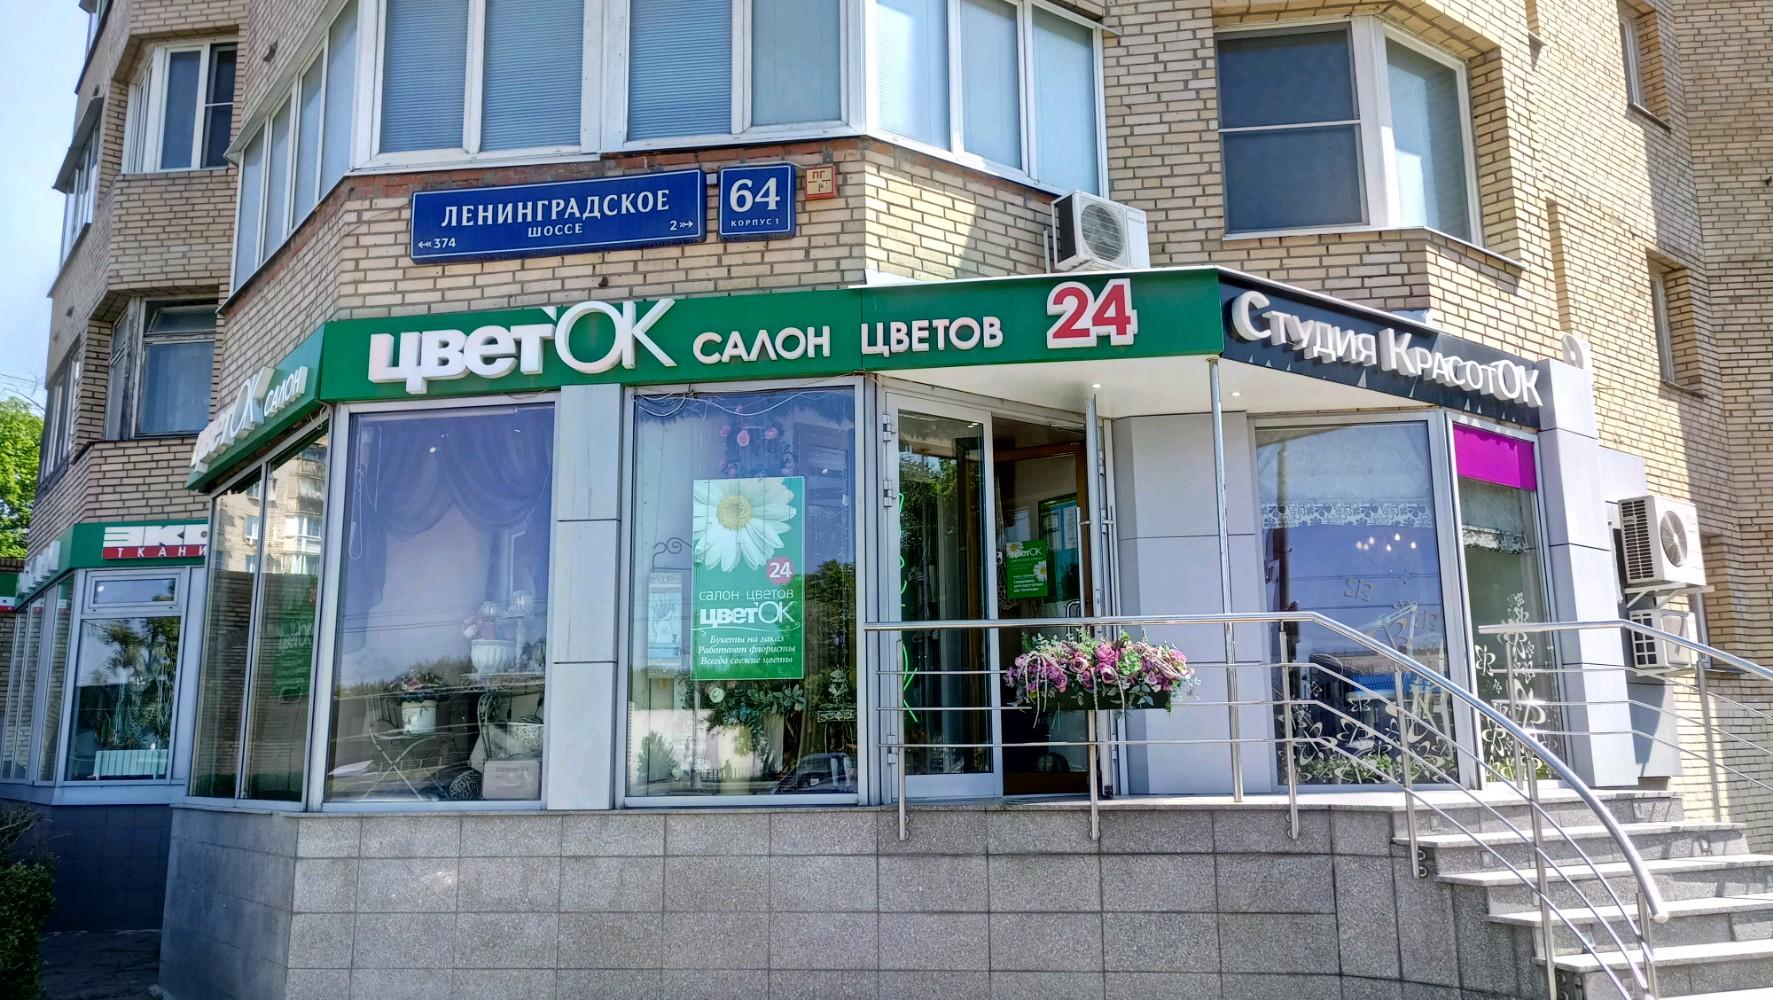 База, магазин цветов москва ленинградское шоссе